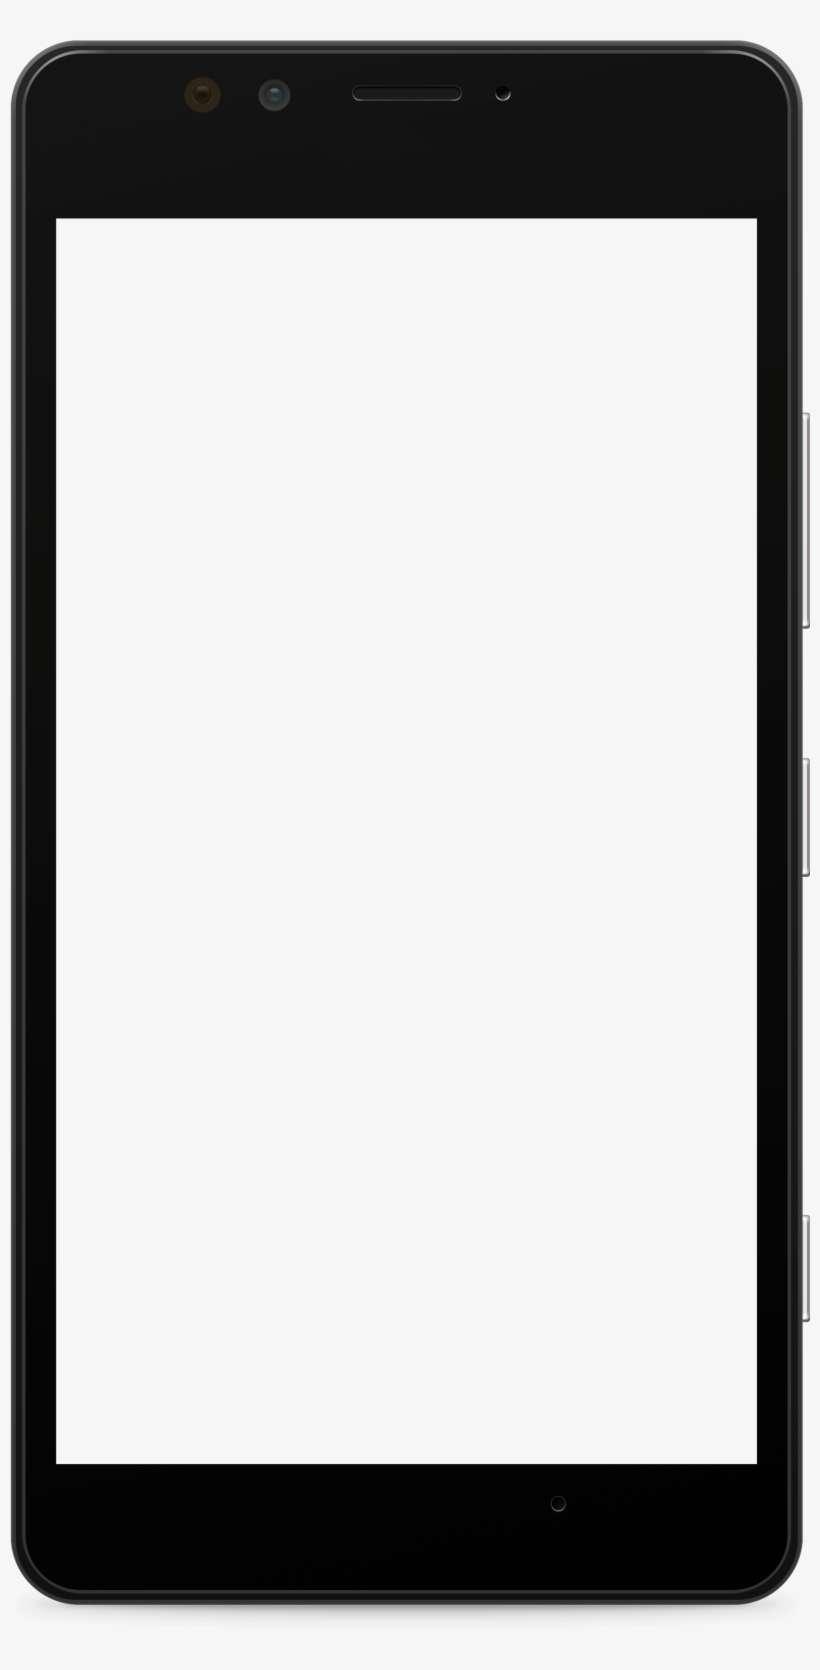 Download - Mobile Phone Frame Download PNG Image